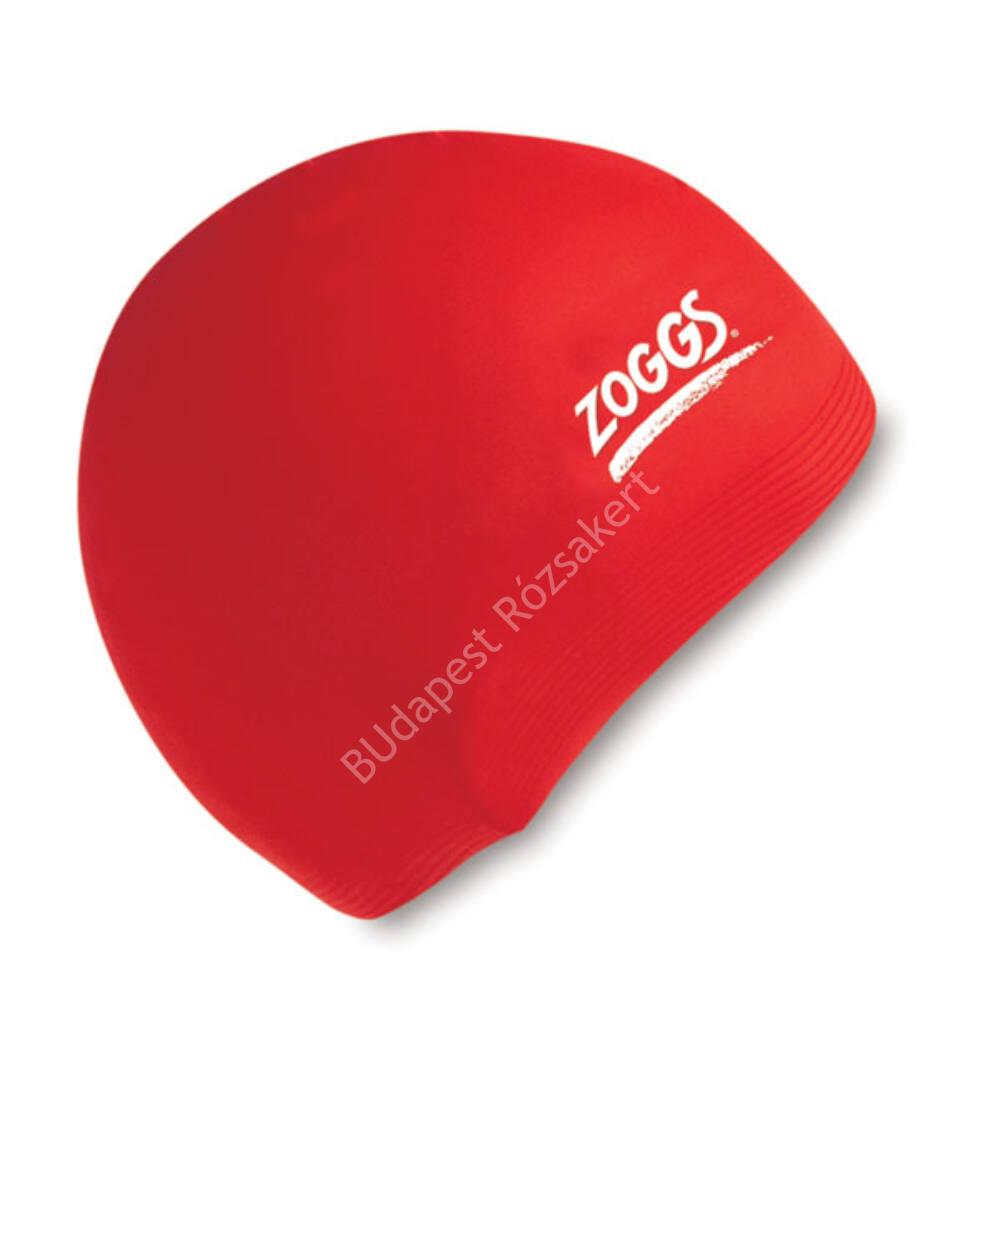 Zoggs silicone felnőtt úszósapka, piros